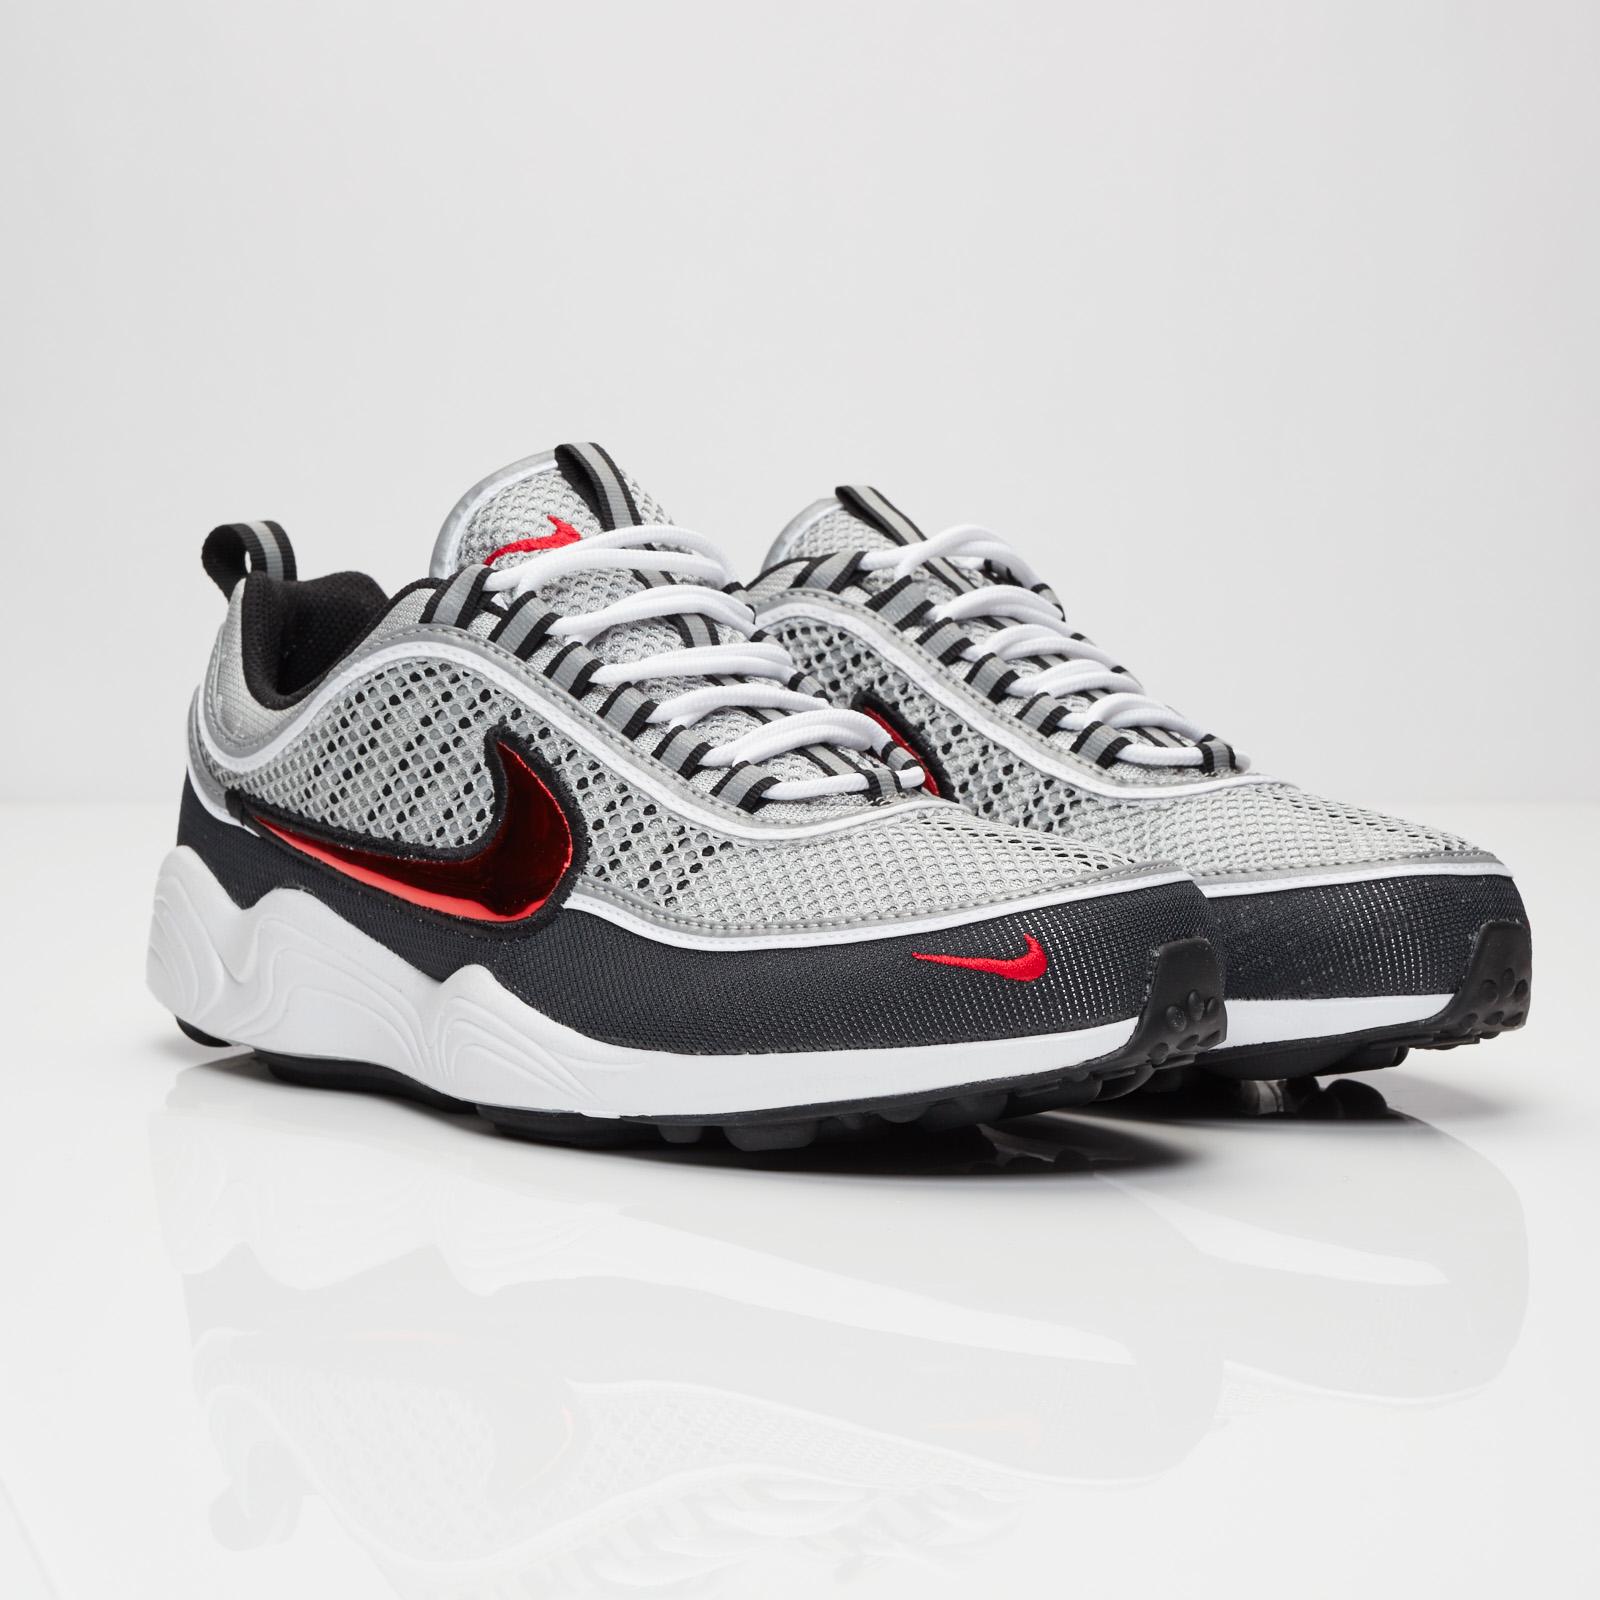 Nike Air Zoom Spiridon - 849776-001 - Sneakersnstuff  761939e3a